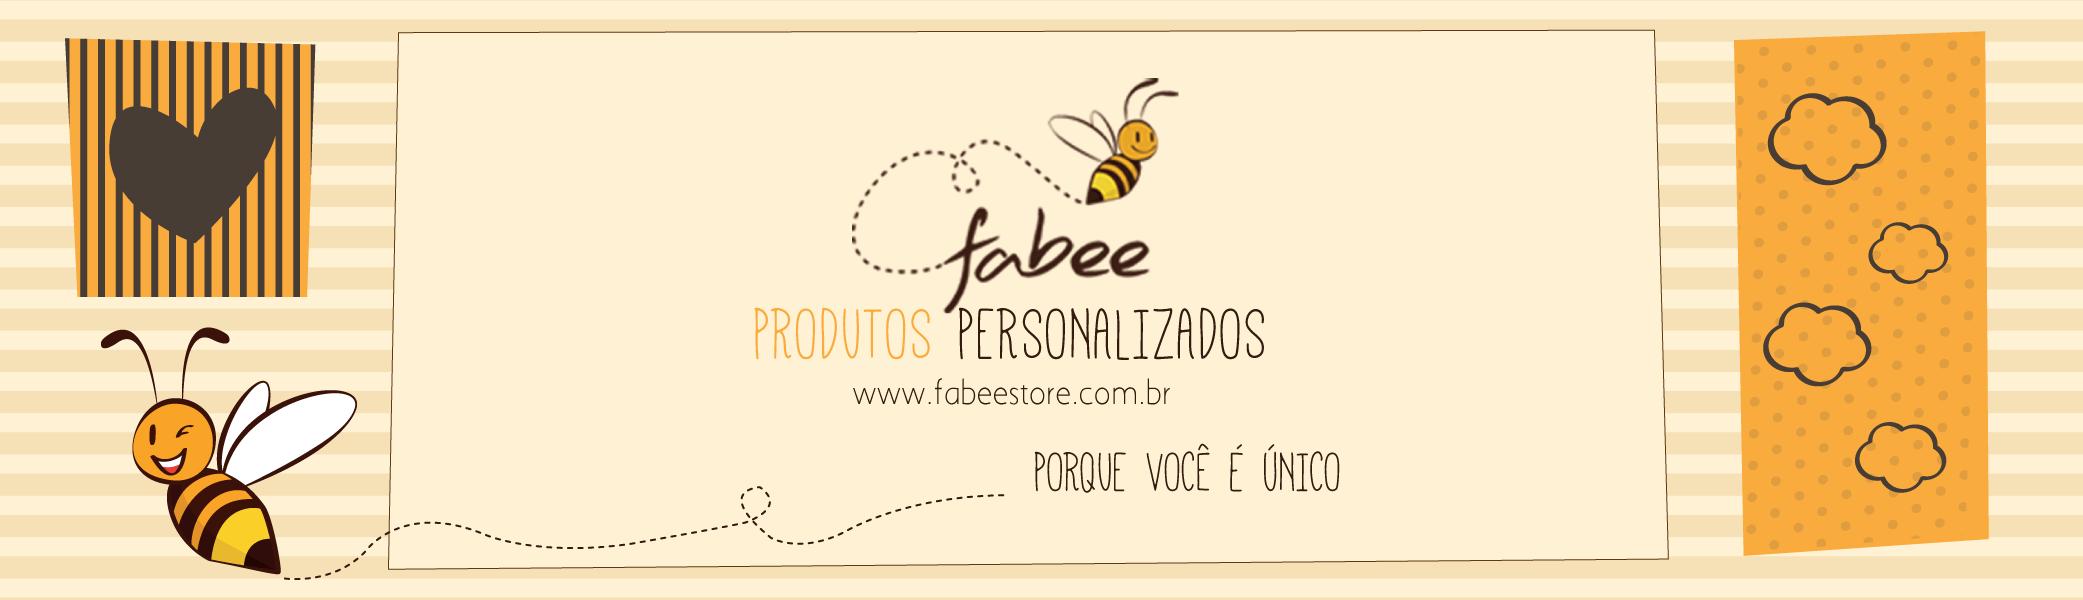 Blog da Fabee Store